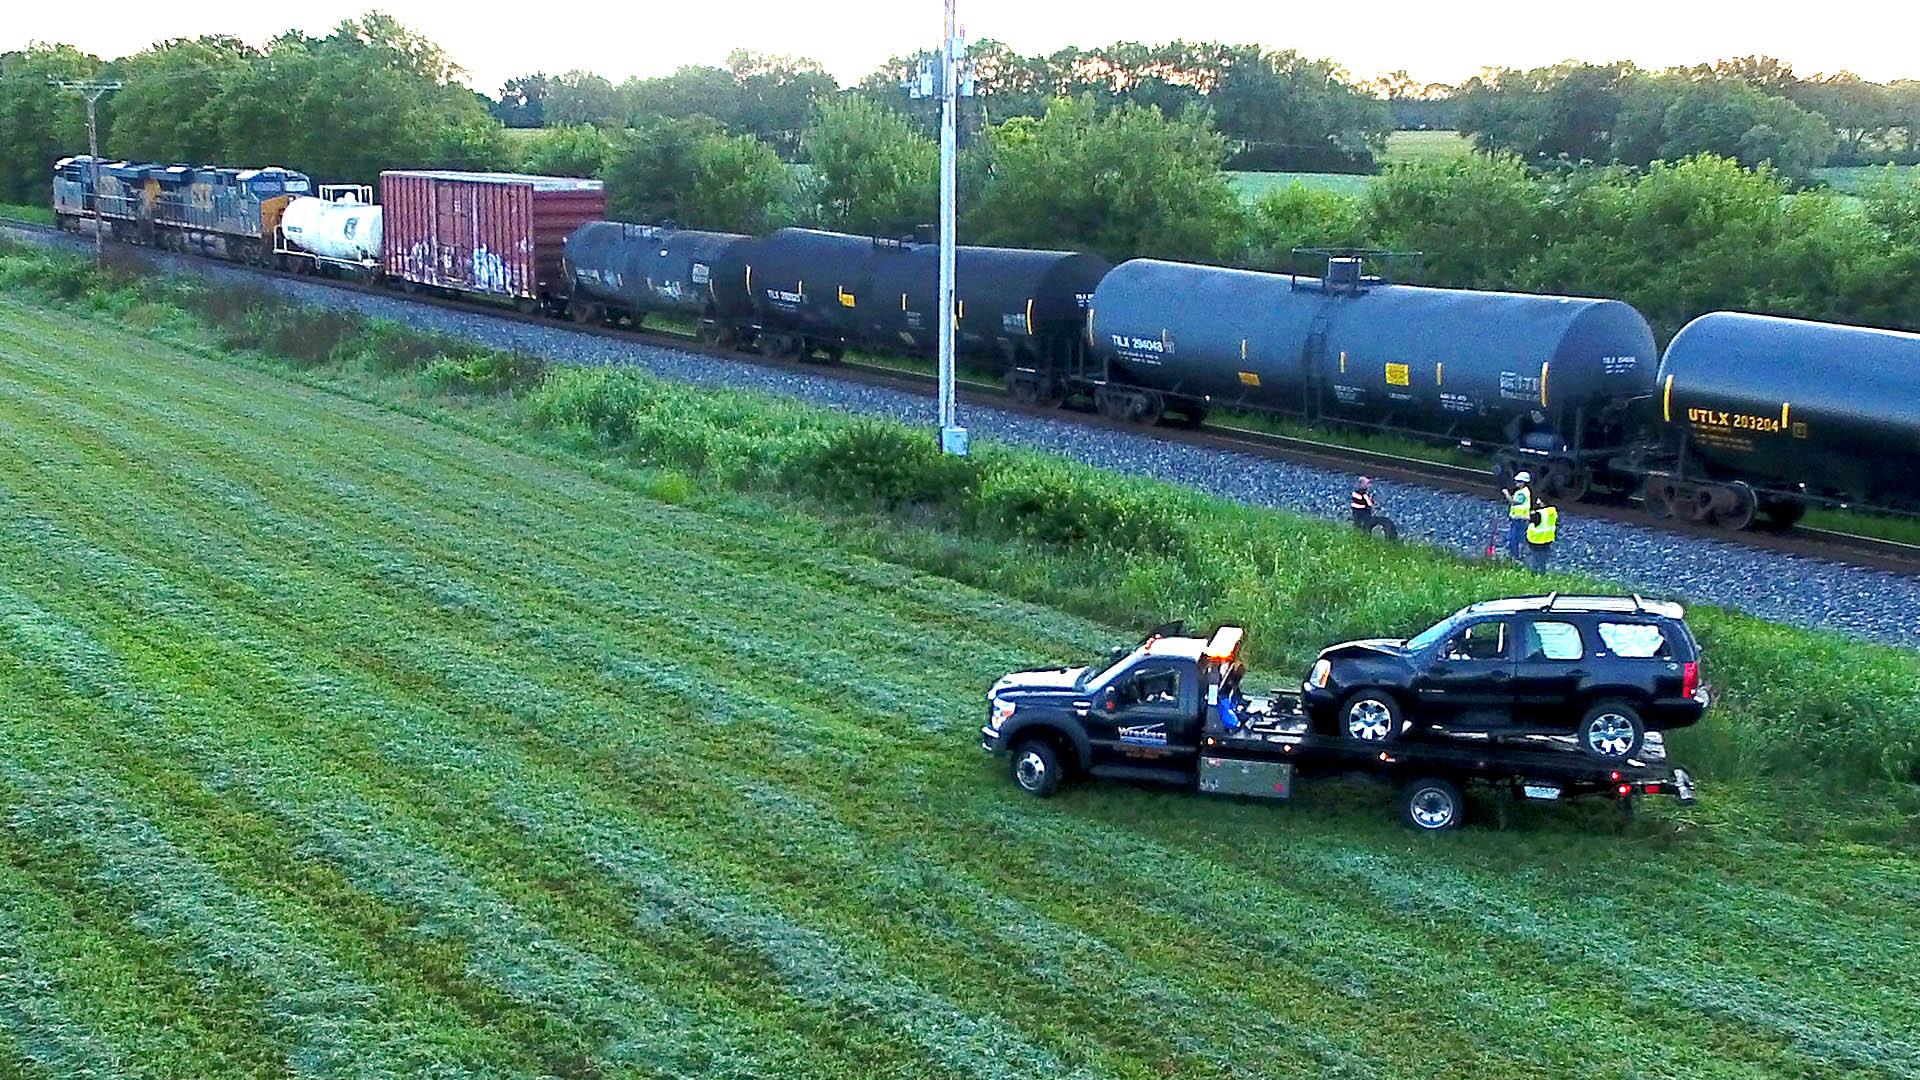 8-6 Car v Train Miami County